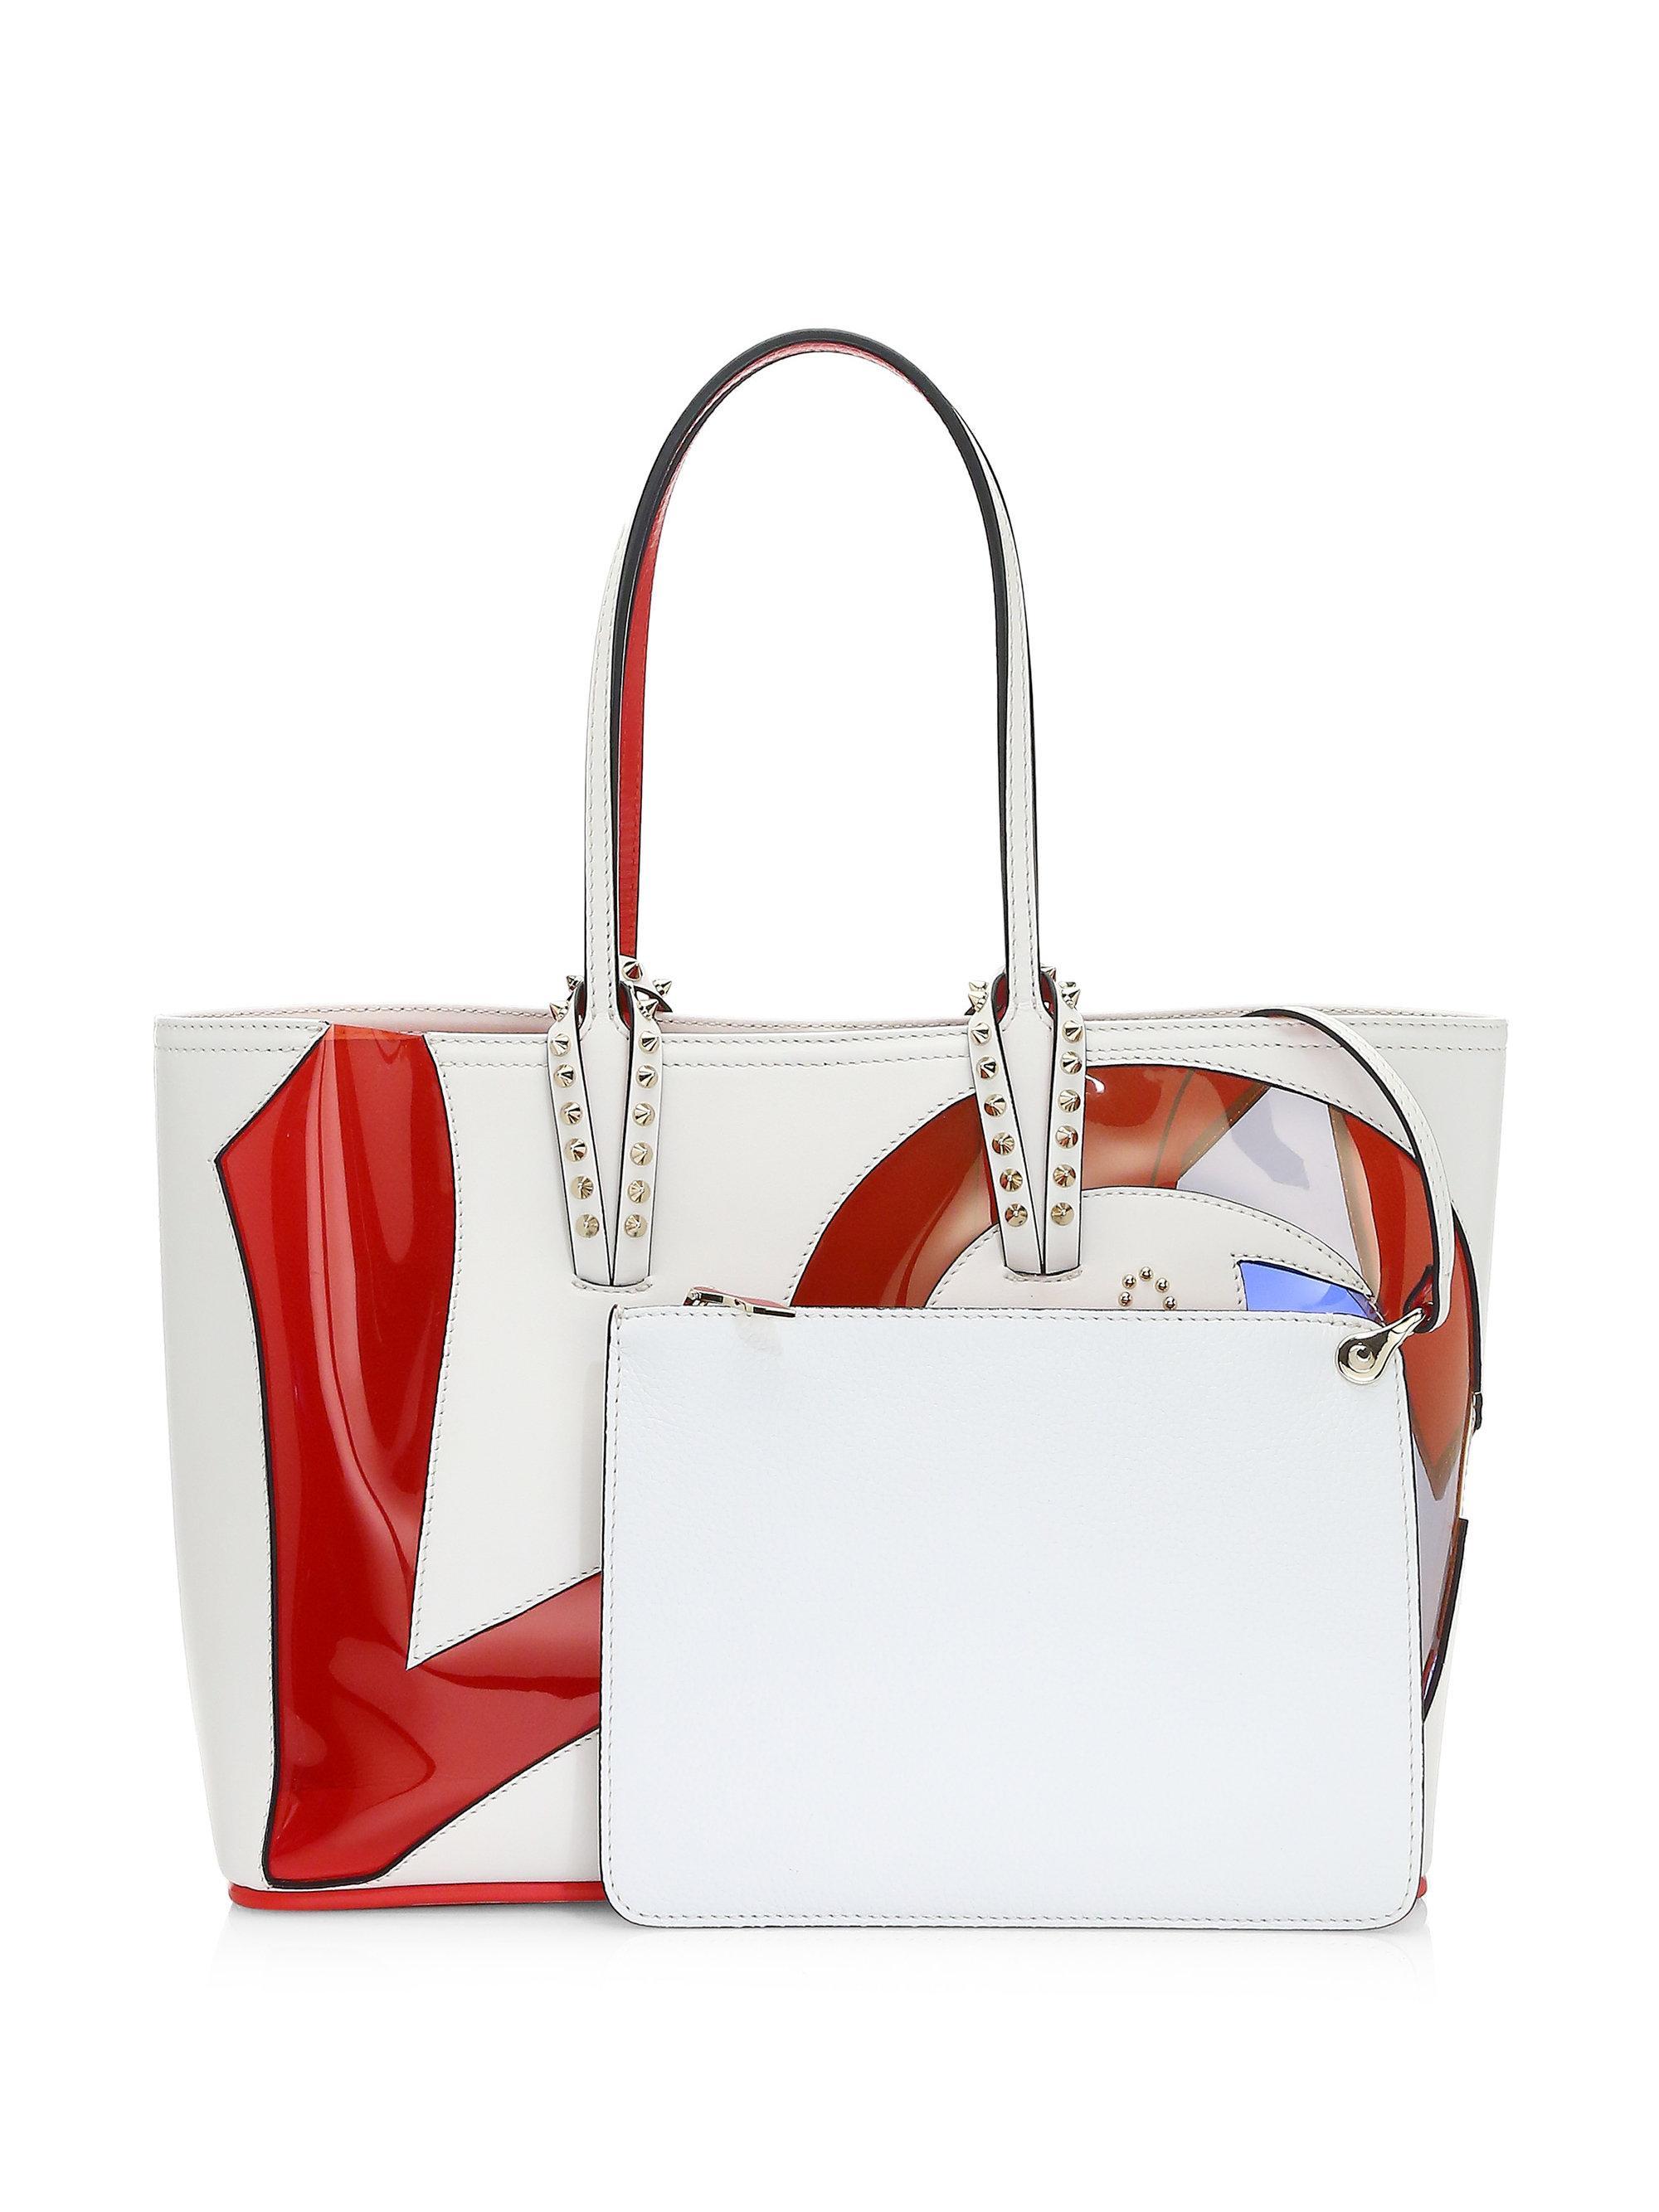 96585c0e594a Christian Louboutin Cabata Love Calf Paris Tote Bag in Red - Lyst